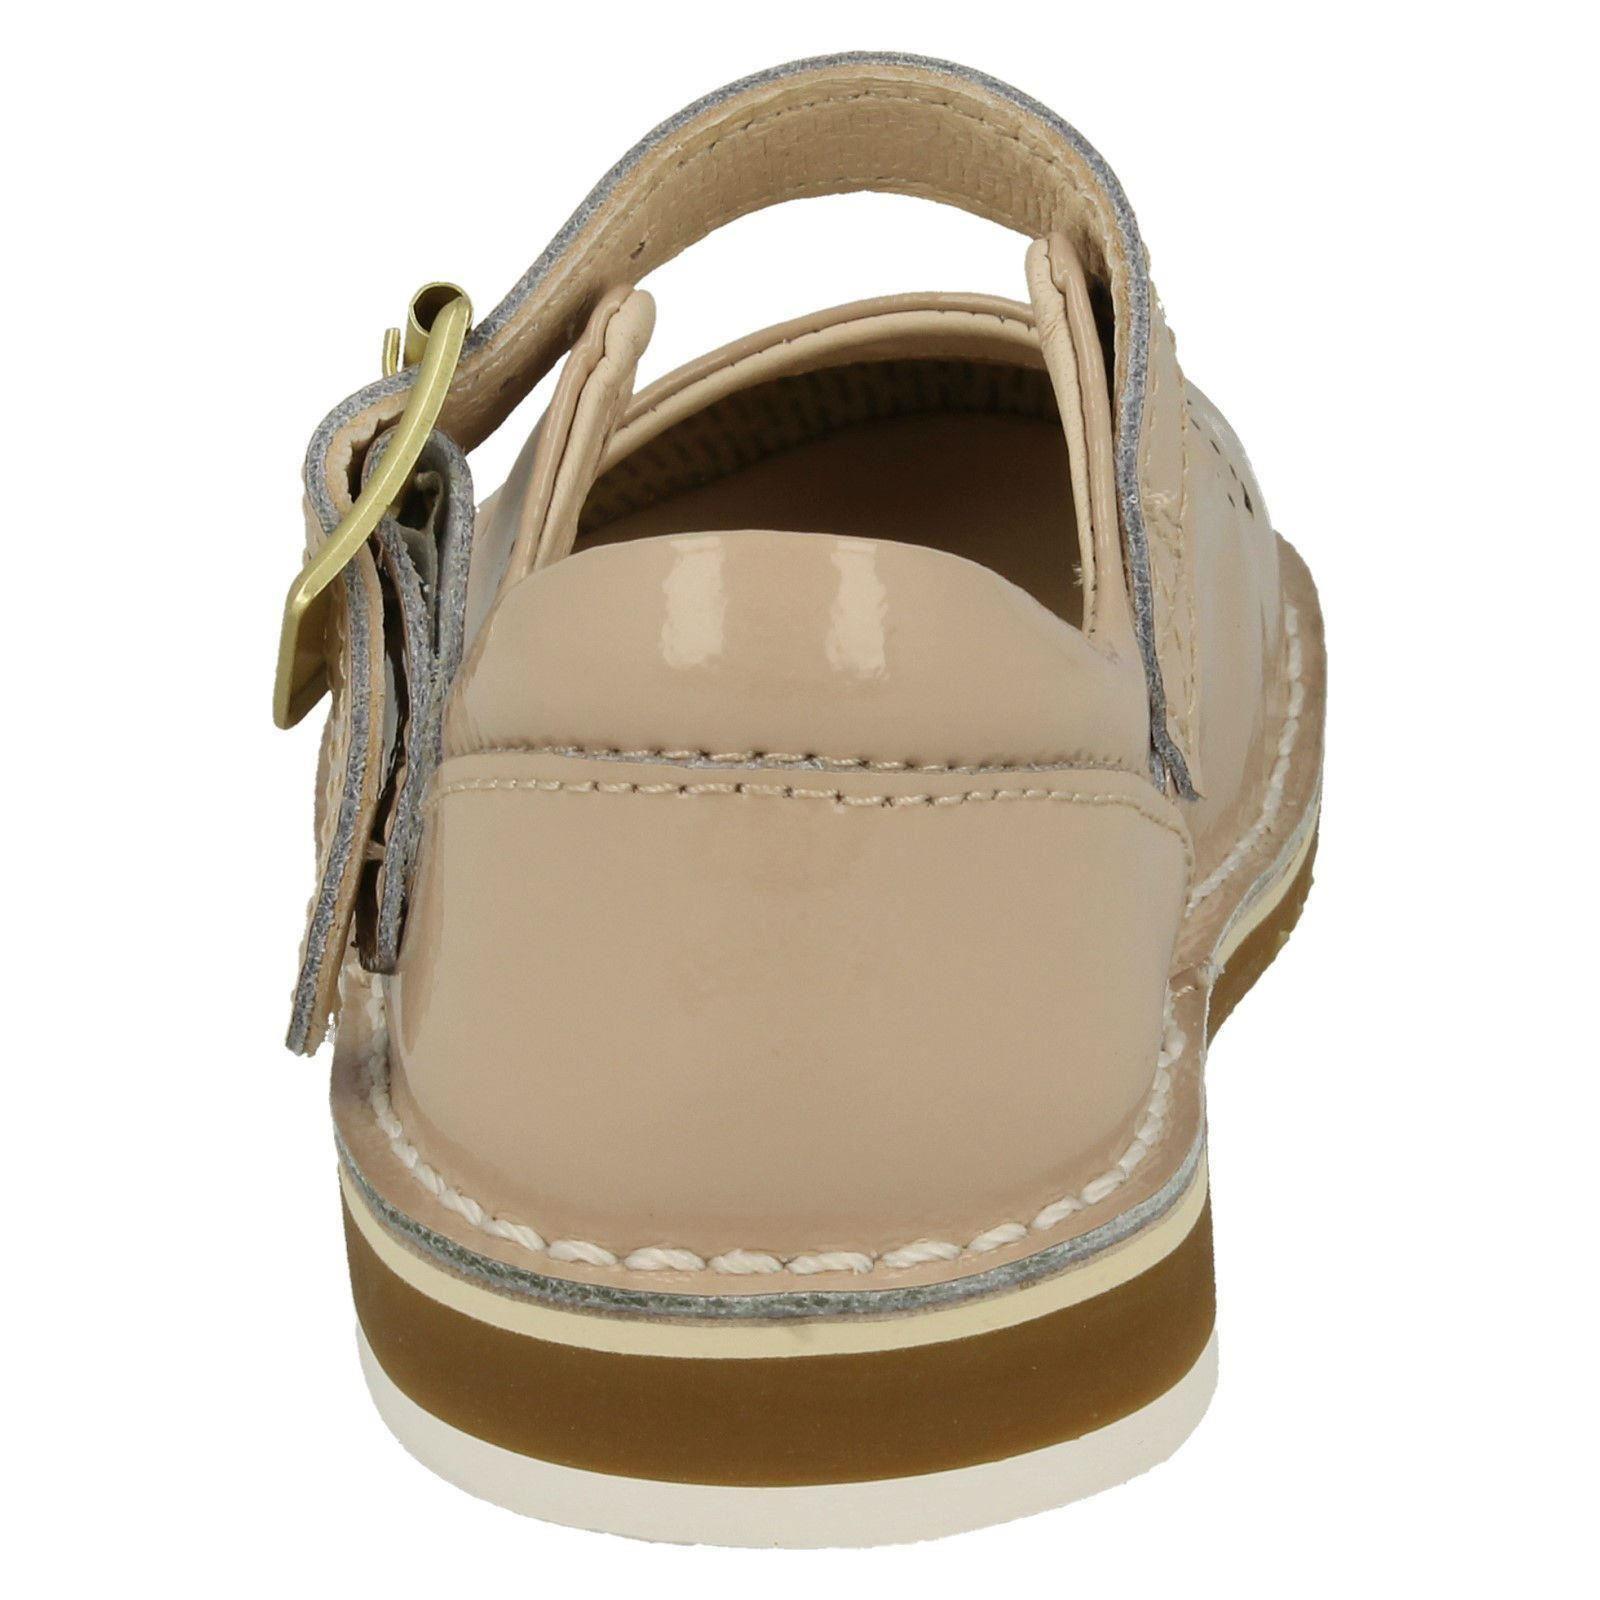 Girls Clarks Casual Shoes Yarn Jump